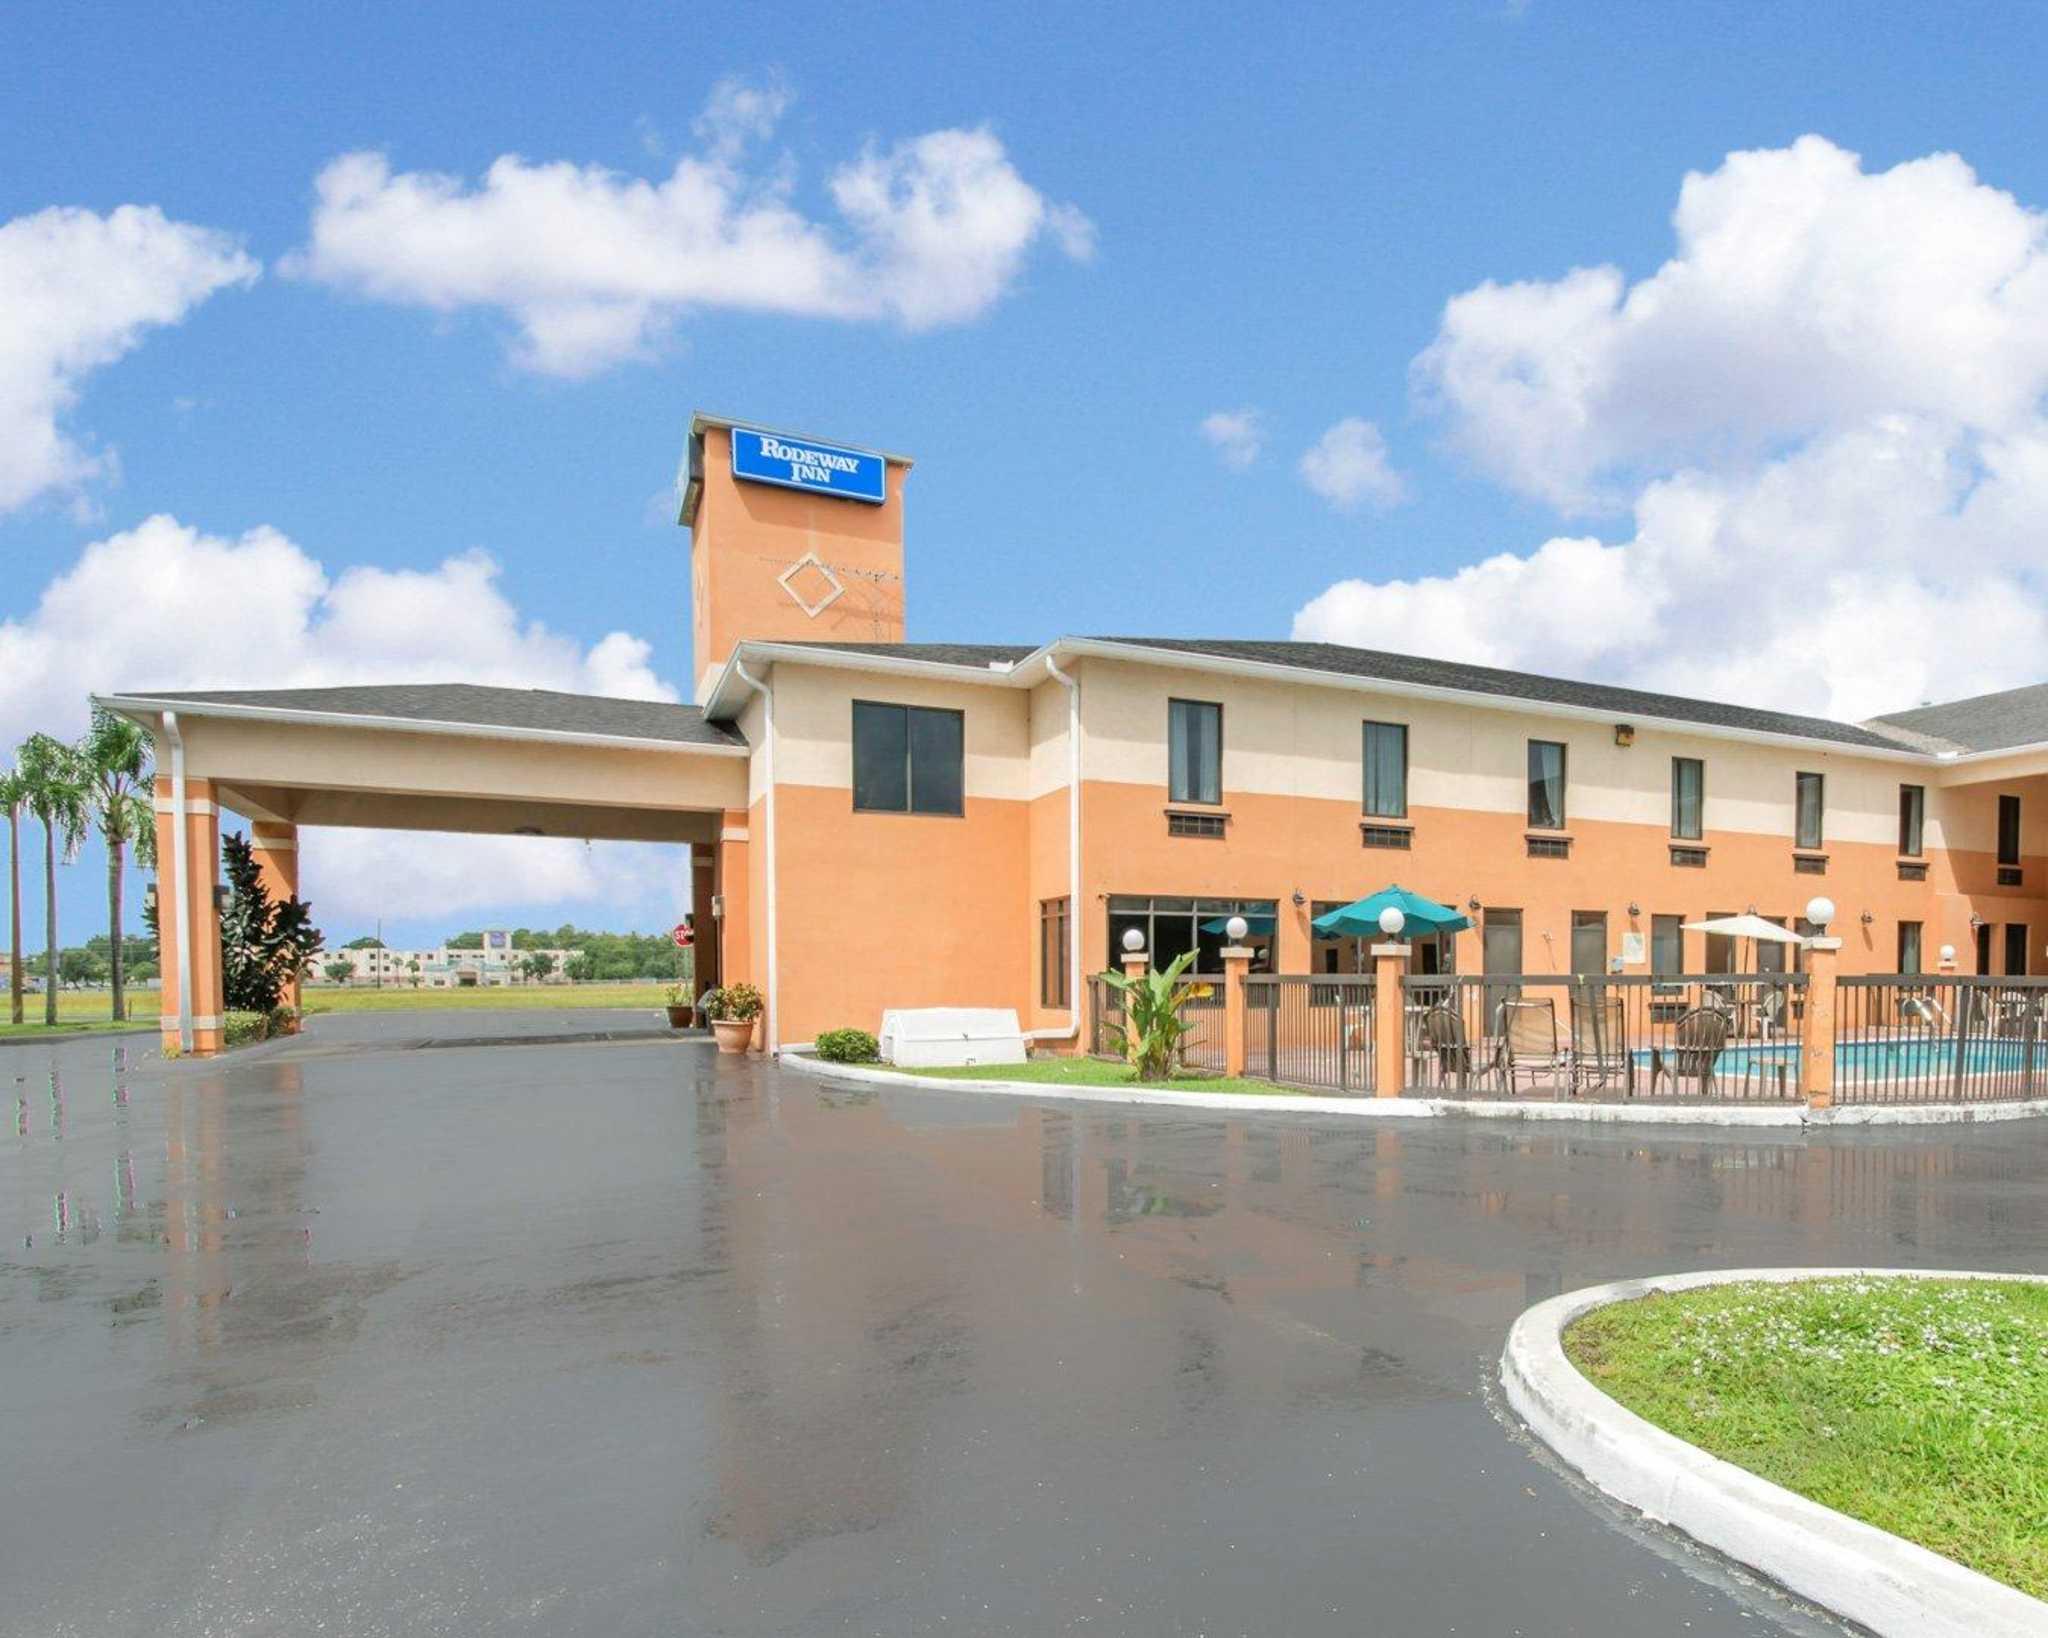 Rodeway Inn image 1